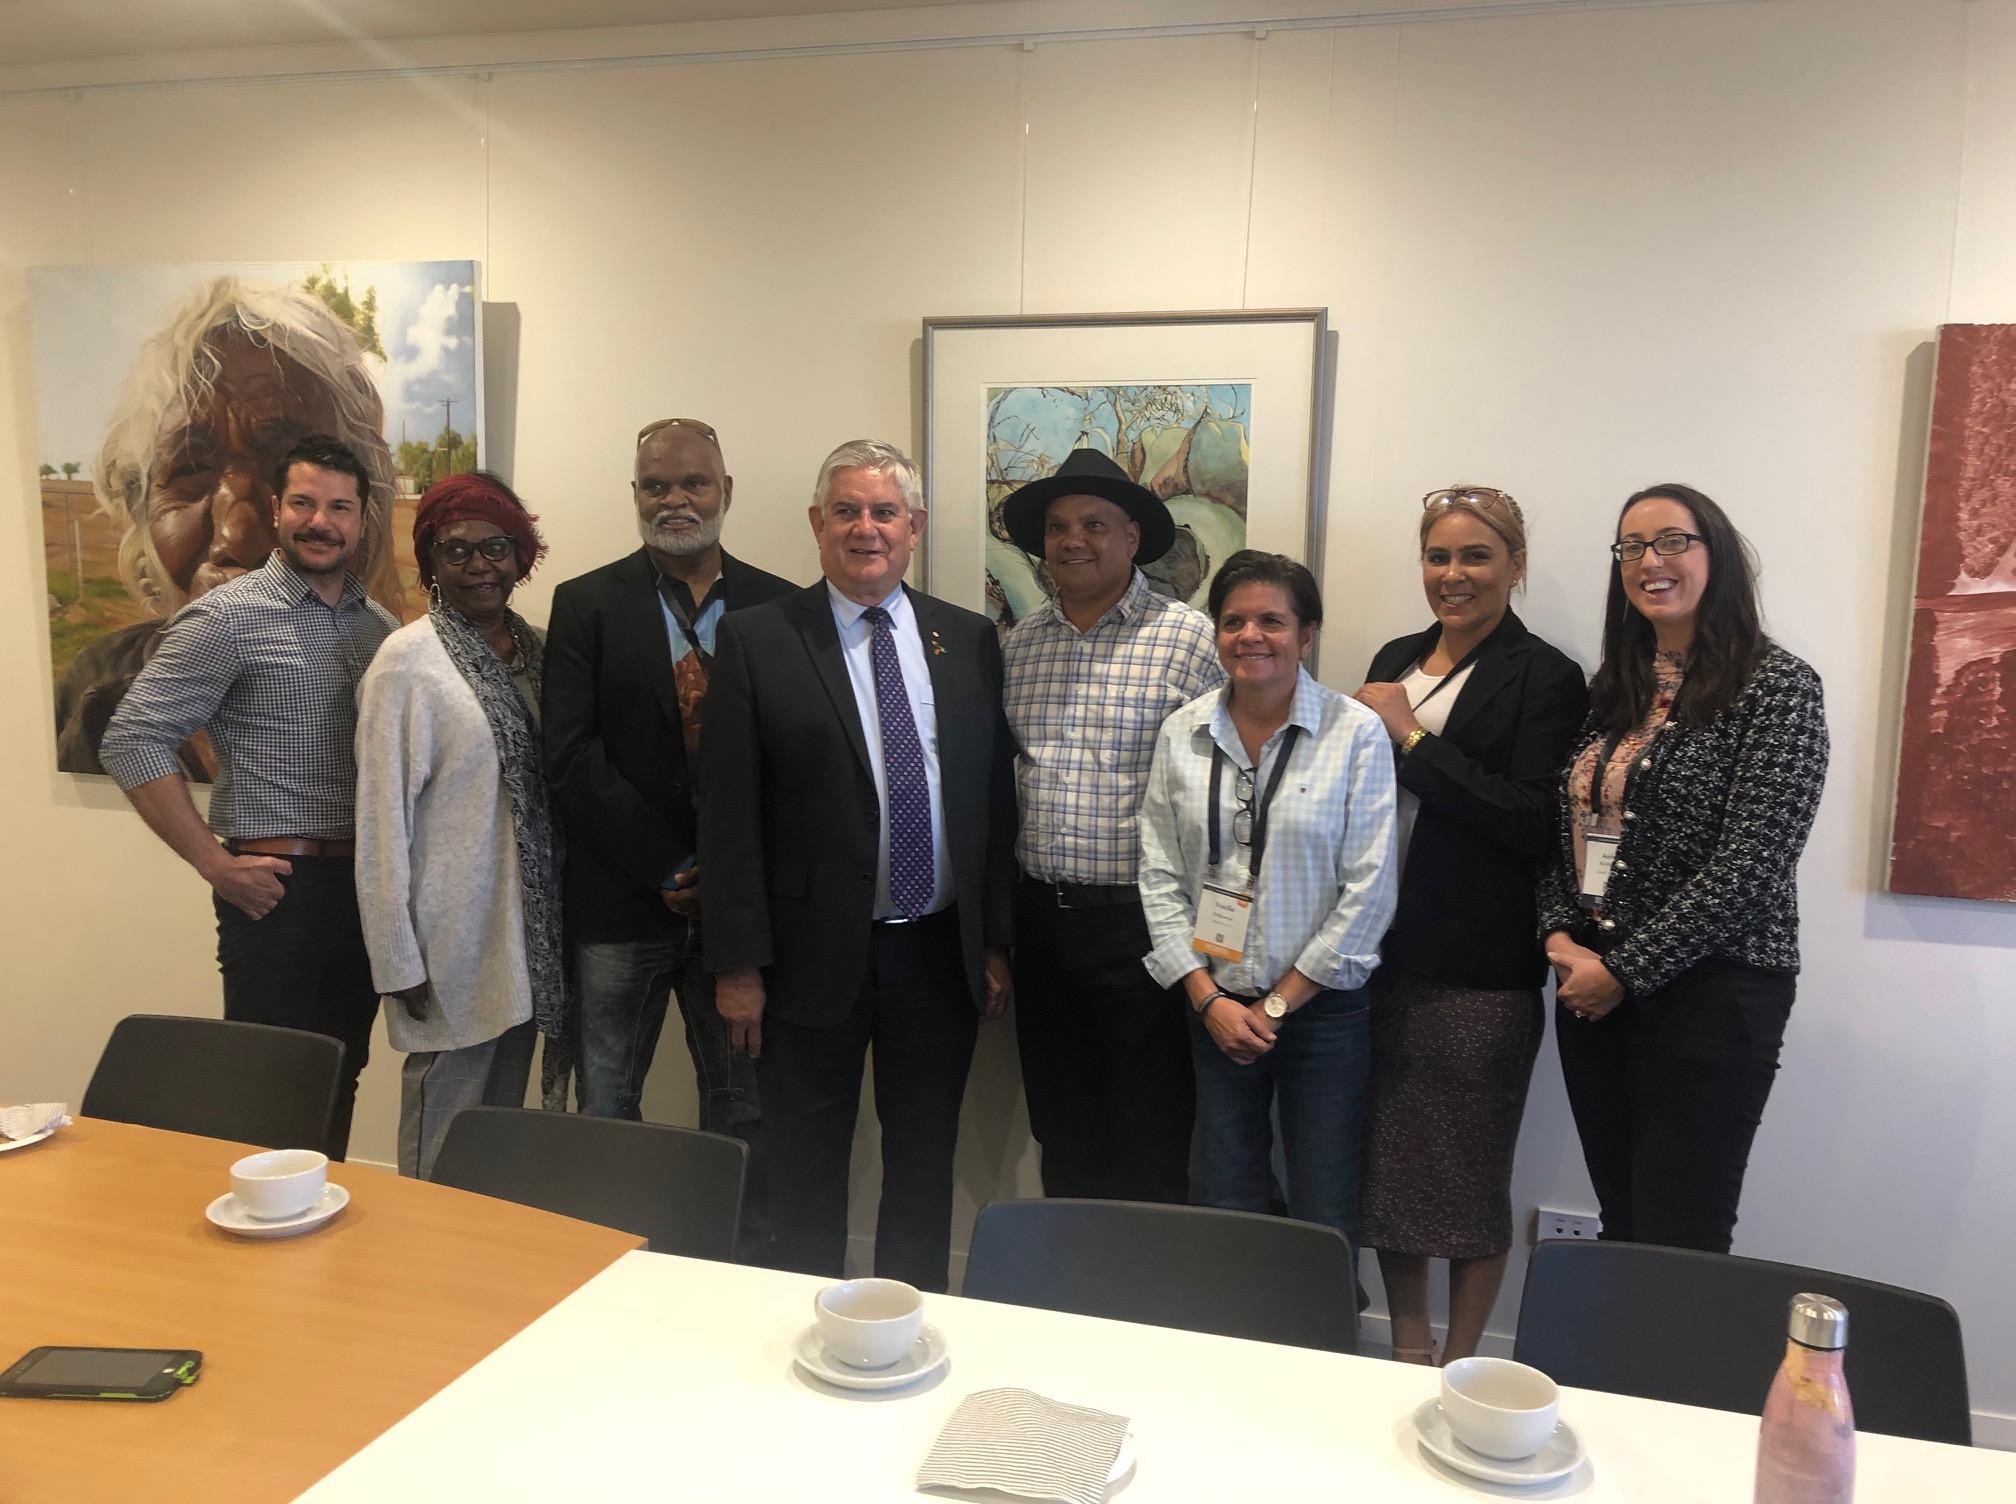 Meeting with The Hon. Ken Wyatt MP